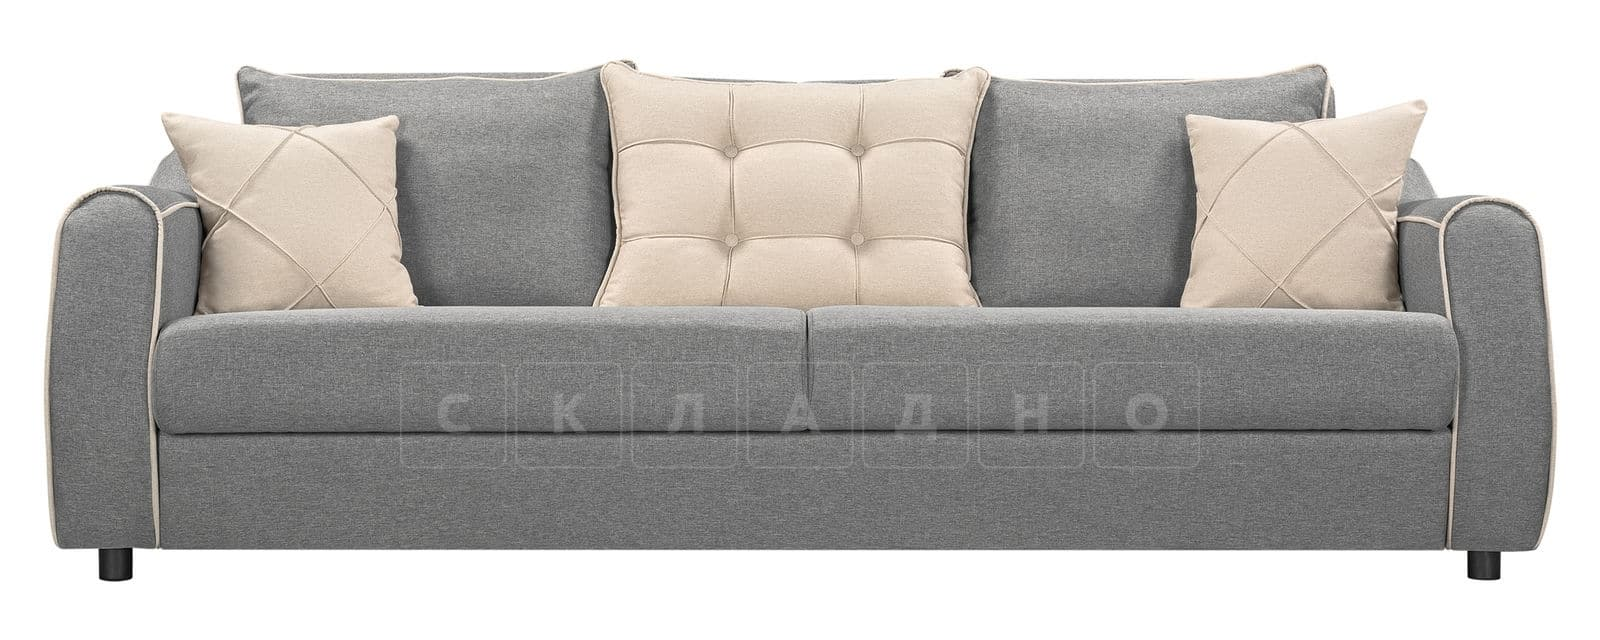 Диван Флэтфорд рогожка серый цвет фото 2 | интернет-магазин Складно